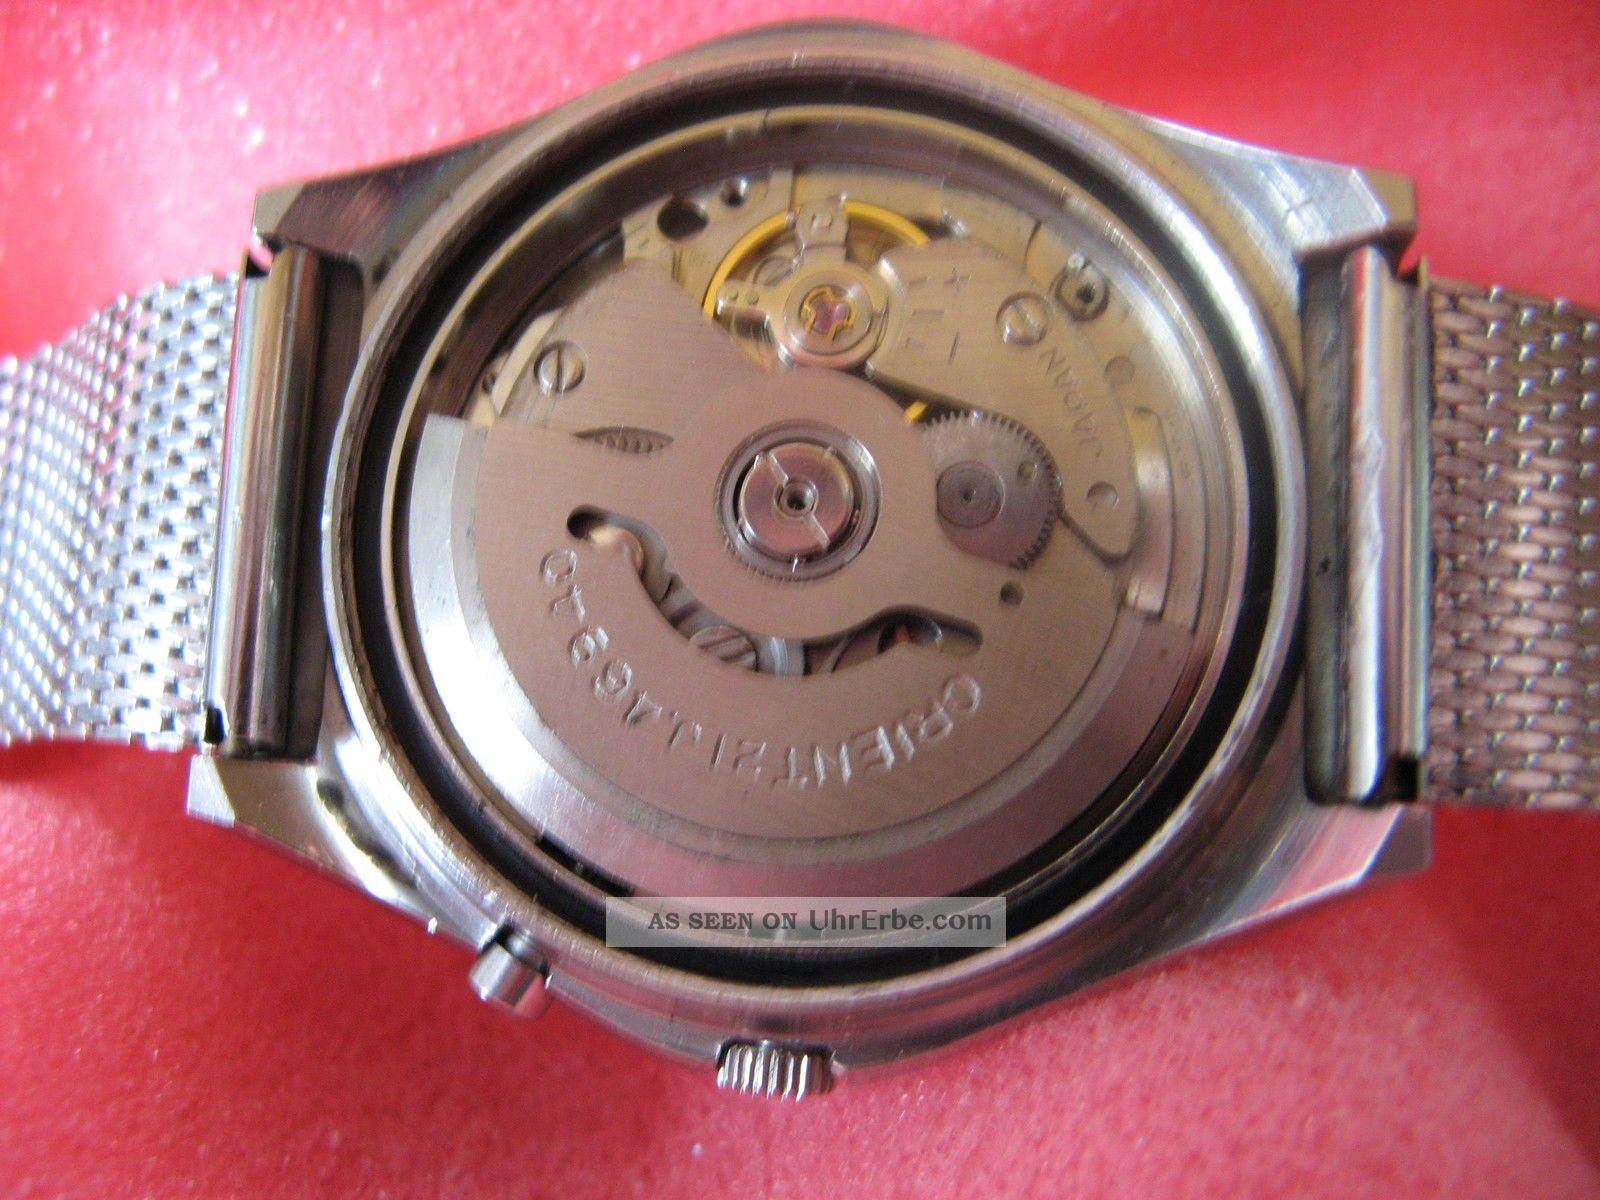 Orient Automatik Herrenuhr Top LÄuft Armbanduhren Bild